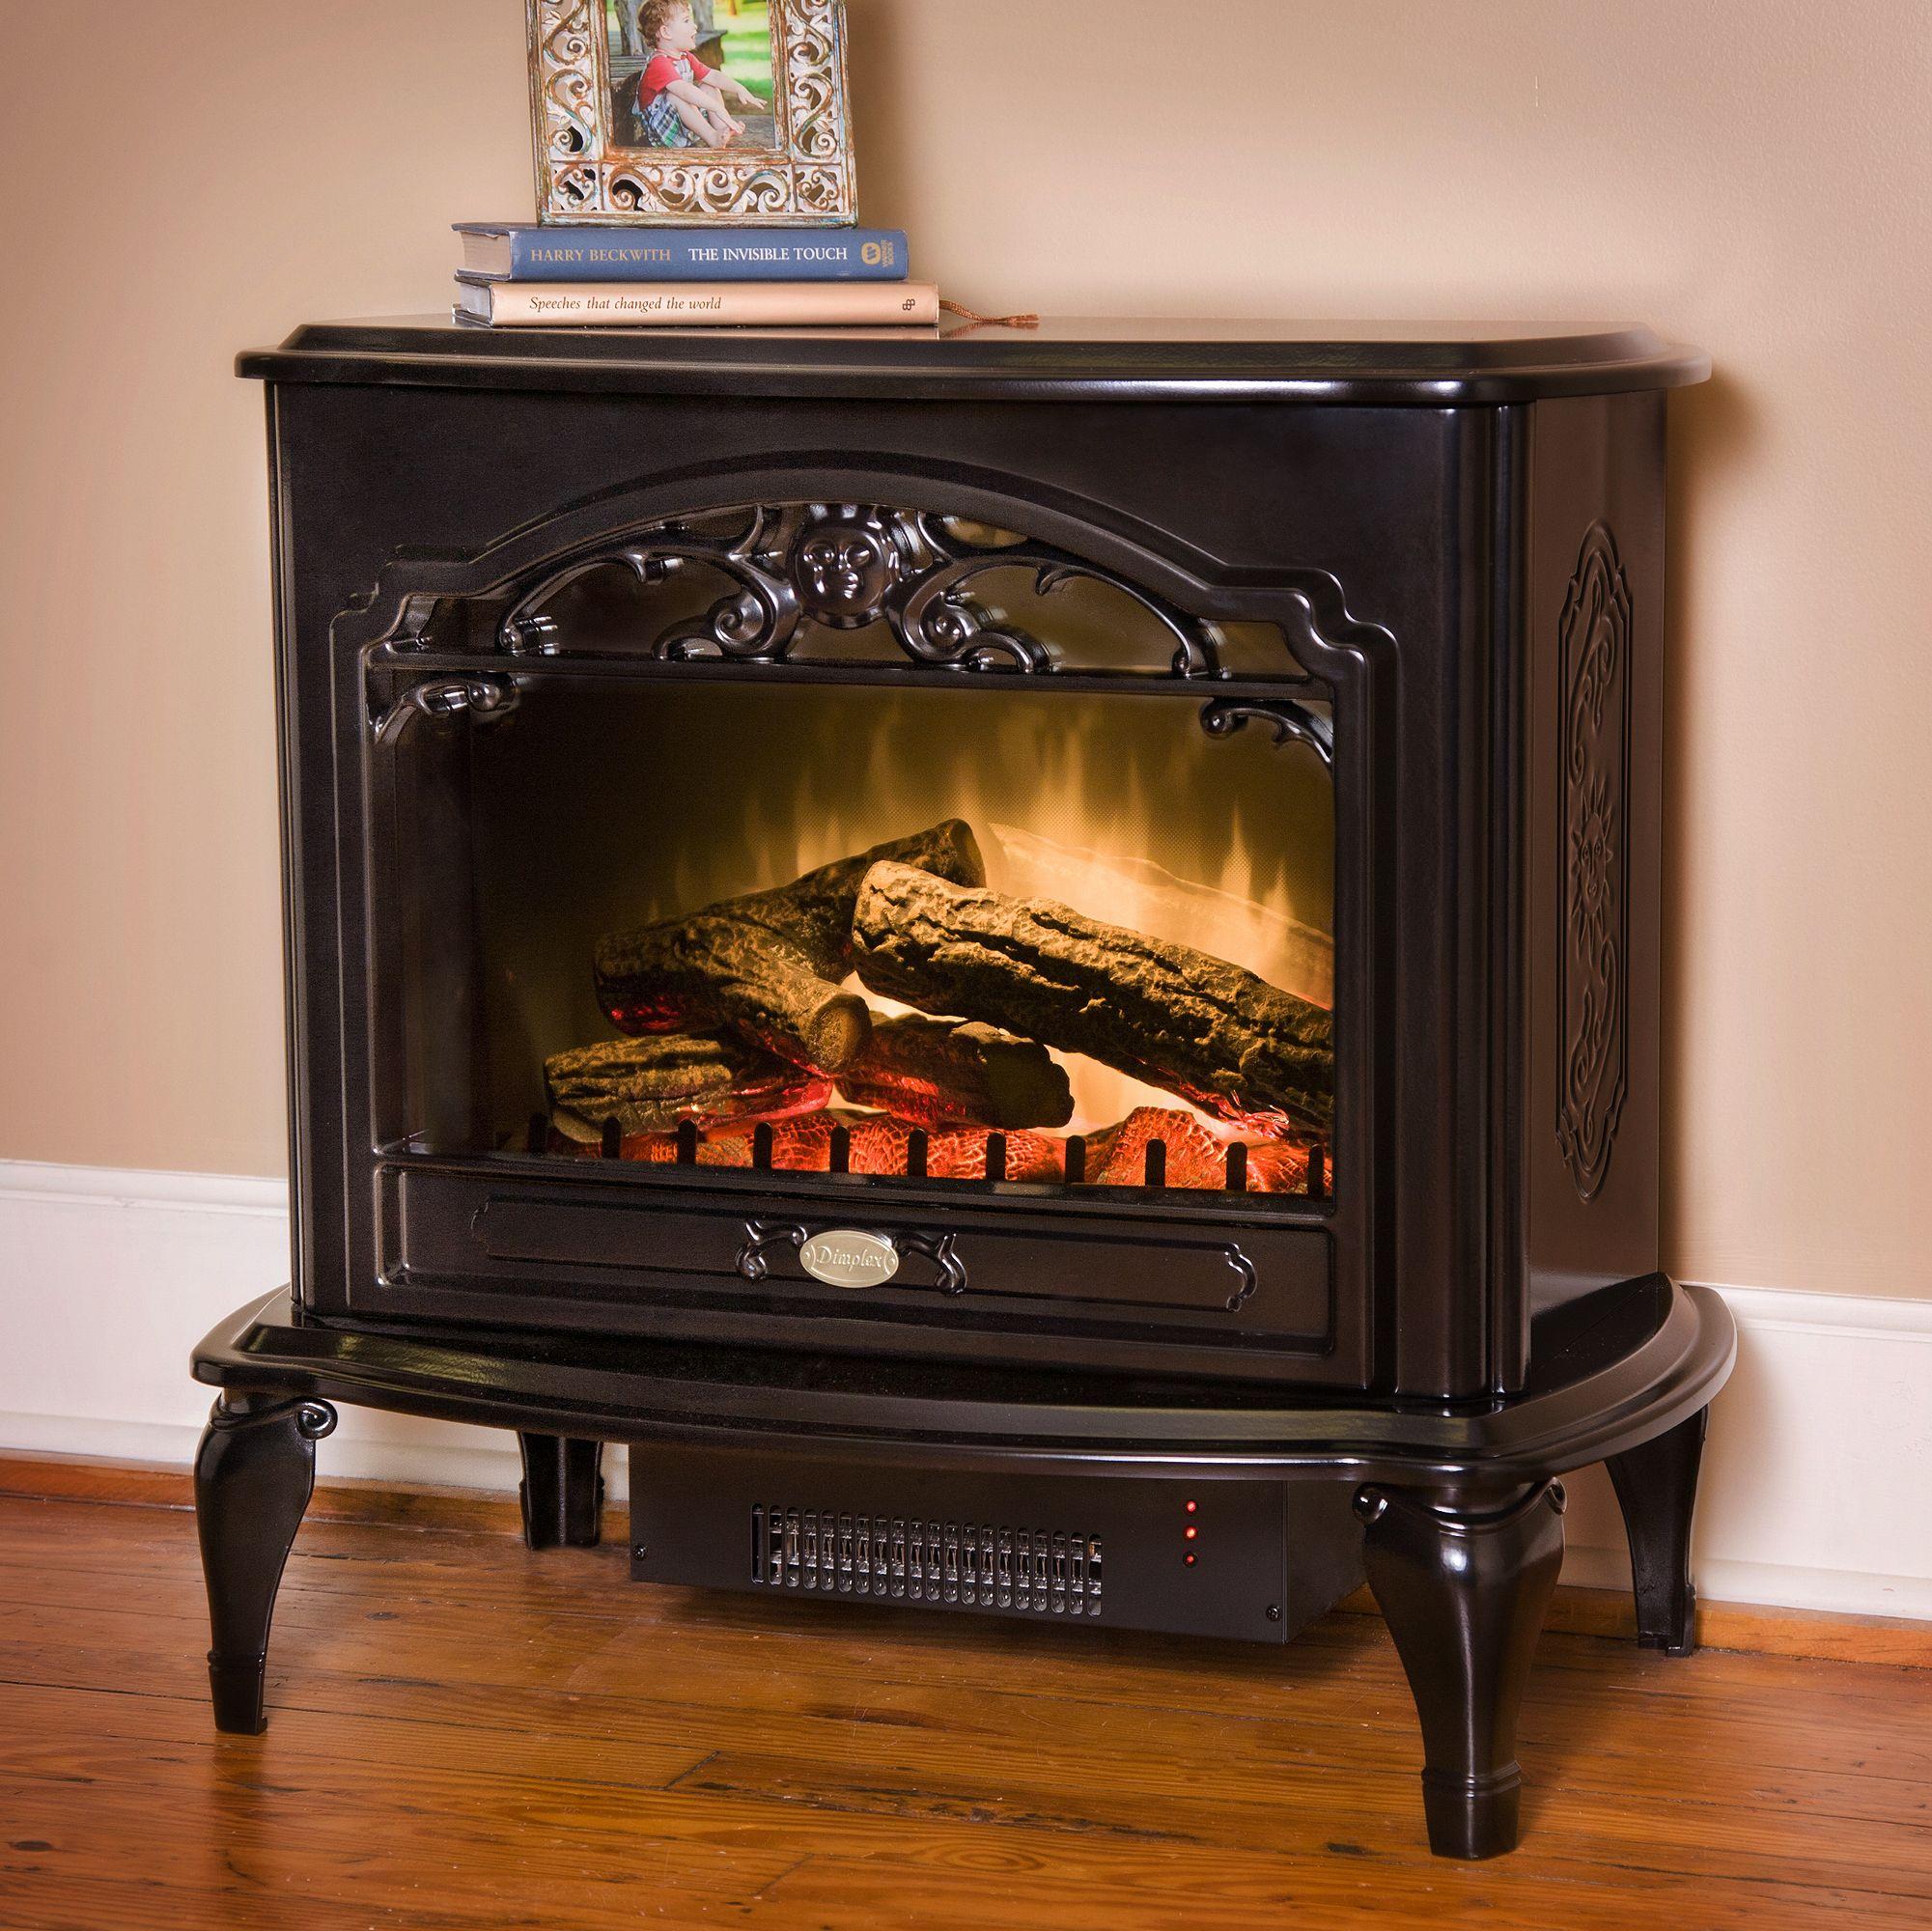 Dimplex Celeste Black Electric Fireplace Stove With Remote Control